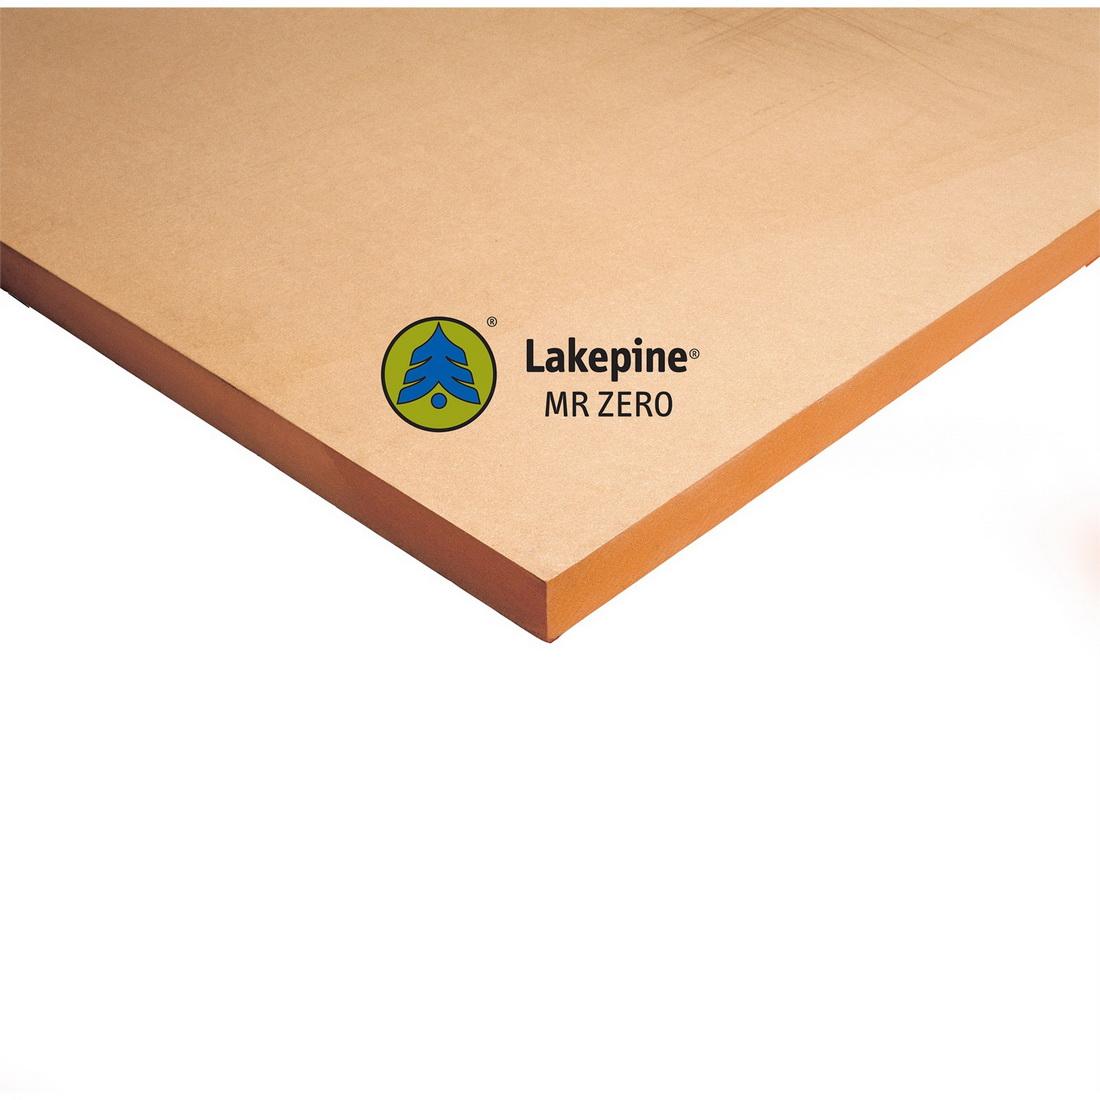 Lakepine Handi Panel 2440 mm x 300 mm x 18 mm MDF 872466